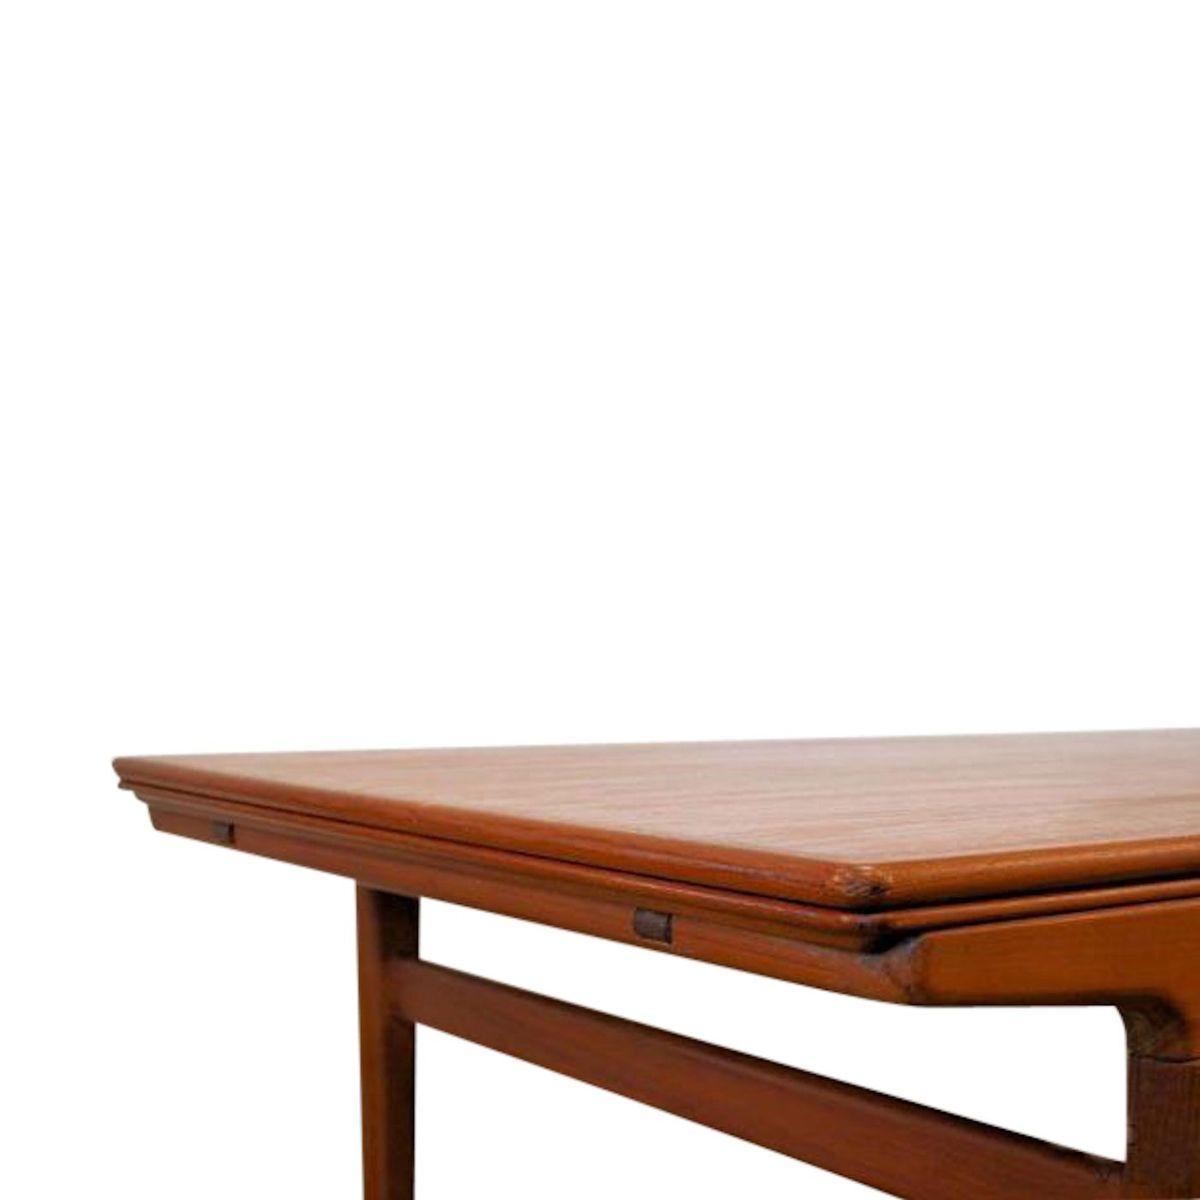 Vintage Teak Extendable Dining Table by Johannes Andersen  : vintage teak extendable dining table by johannes andersen for uldum mobelfabrik 5 from www.pamono.com size 1200 x 1200 jpeg 38kB